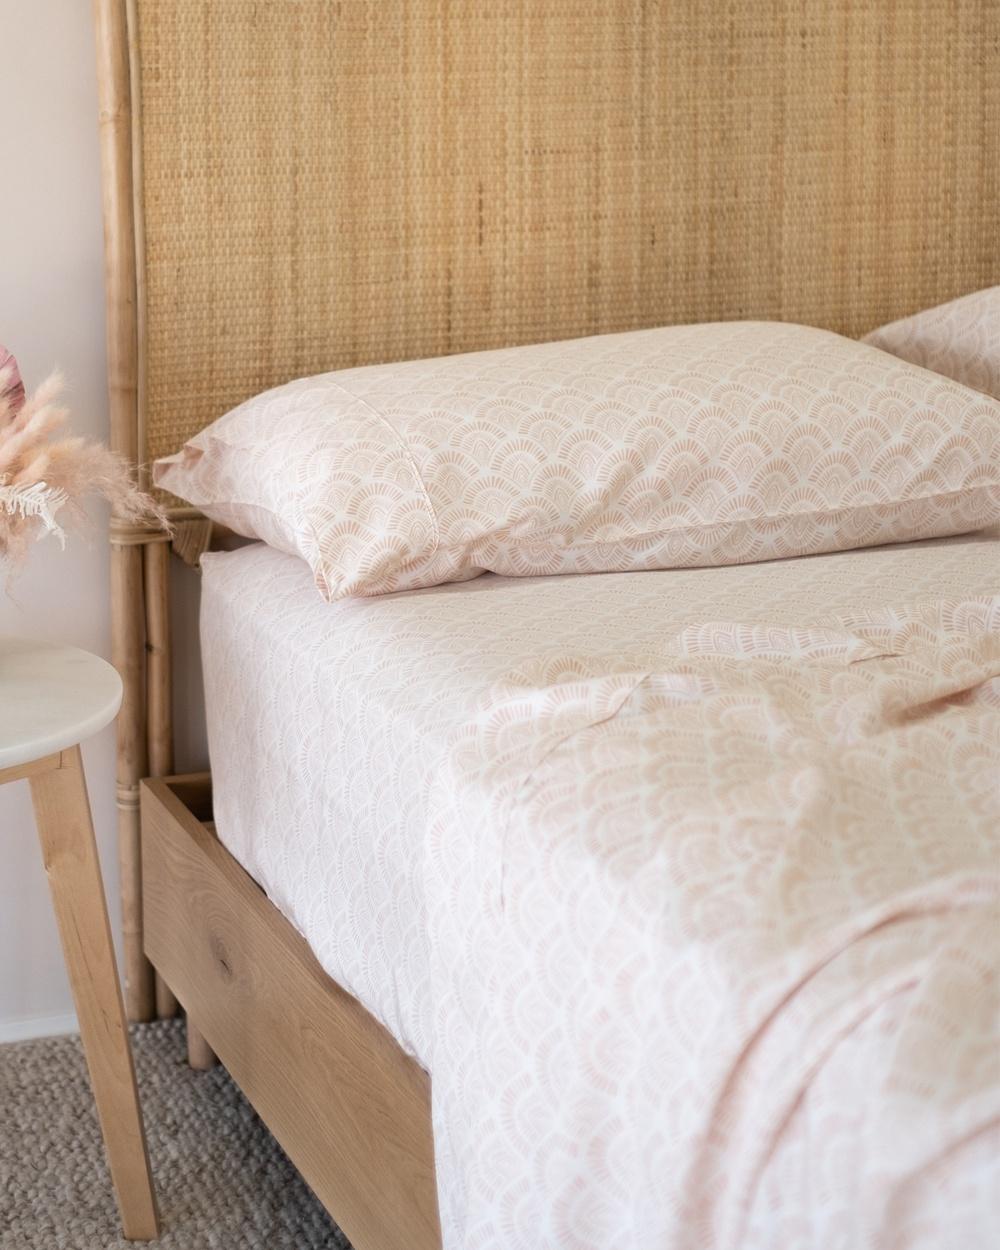 Mulberry Threads 100% Organic Bamboo Sheet Set Home Pink Australia